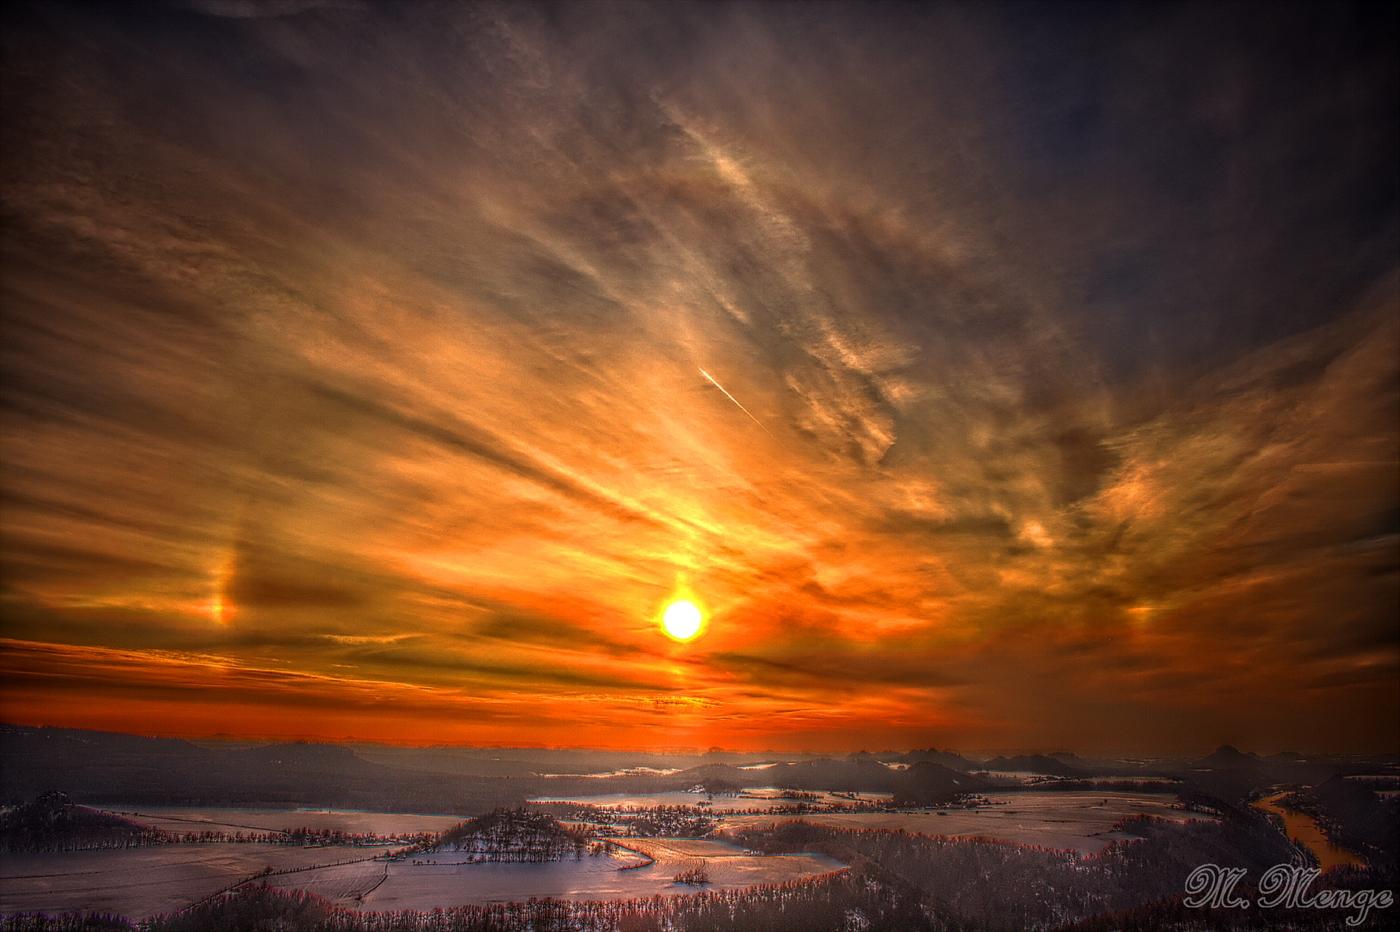 Sonnenuntergang mit Halo-Effekt